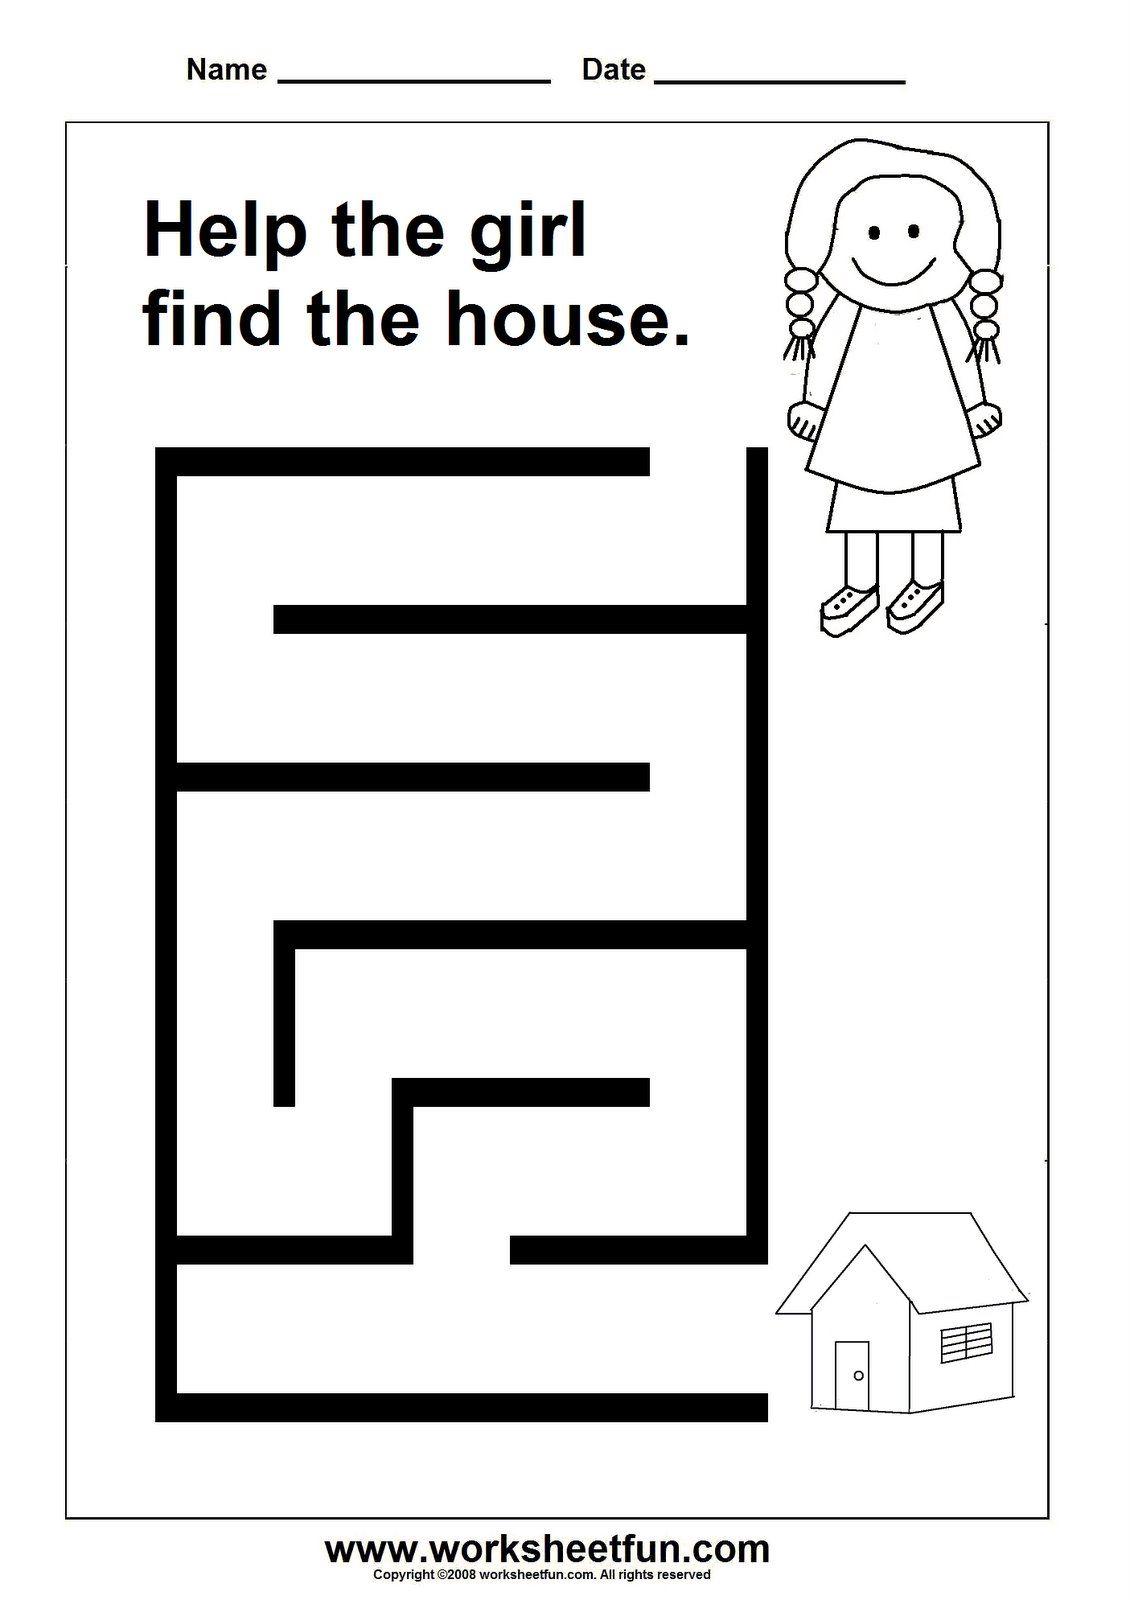 Pin by Kim Lauwers on Binder time   Preschool workbooks ...